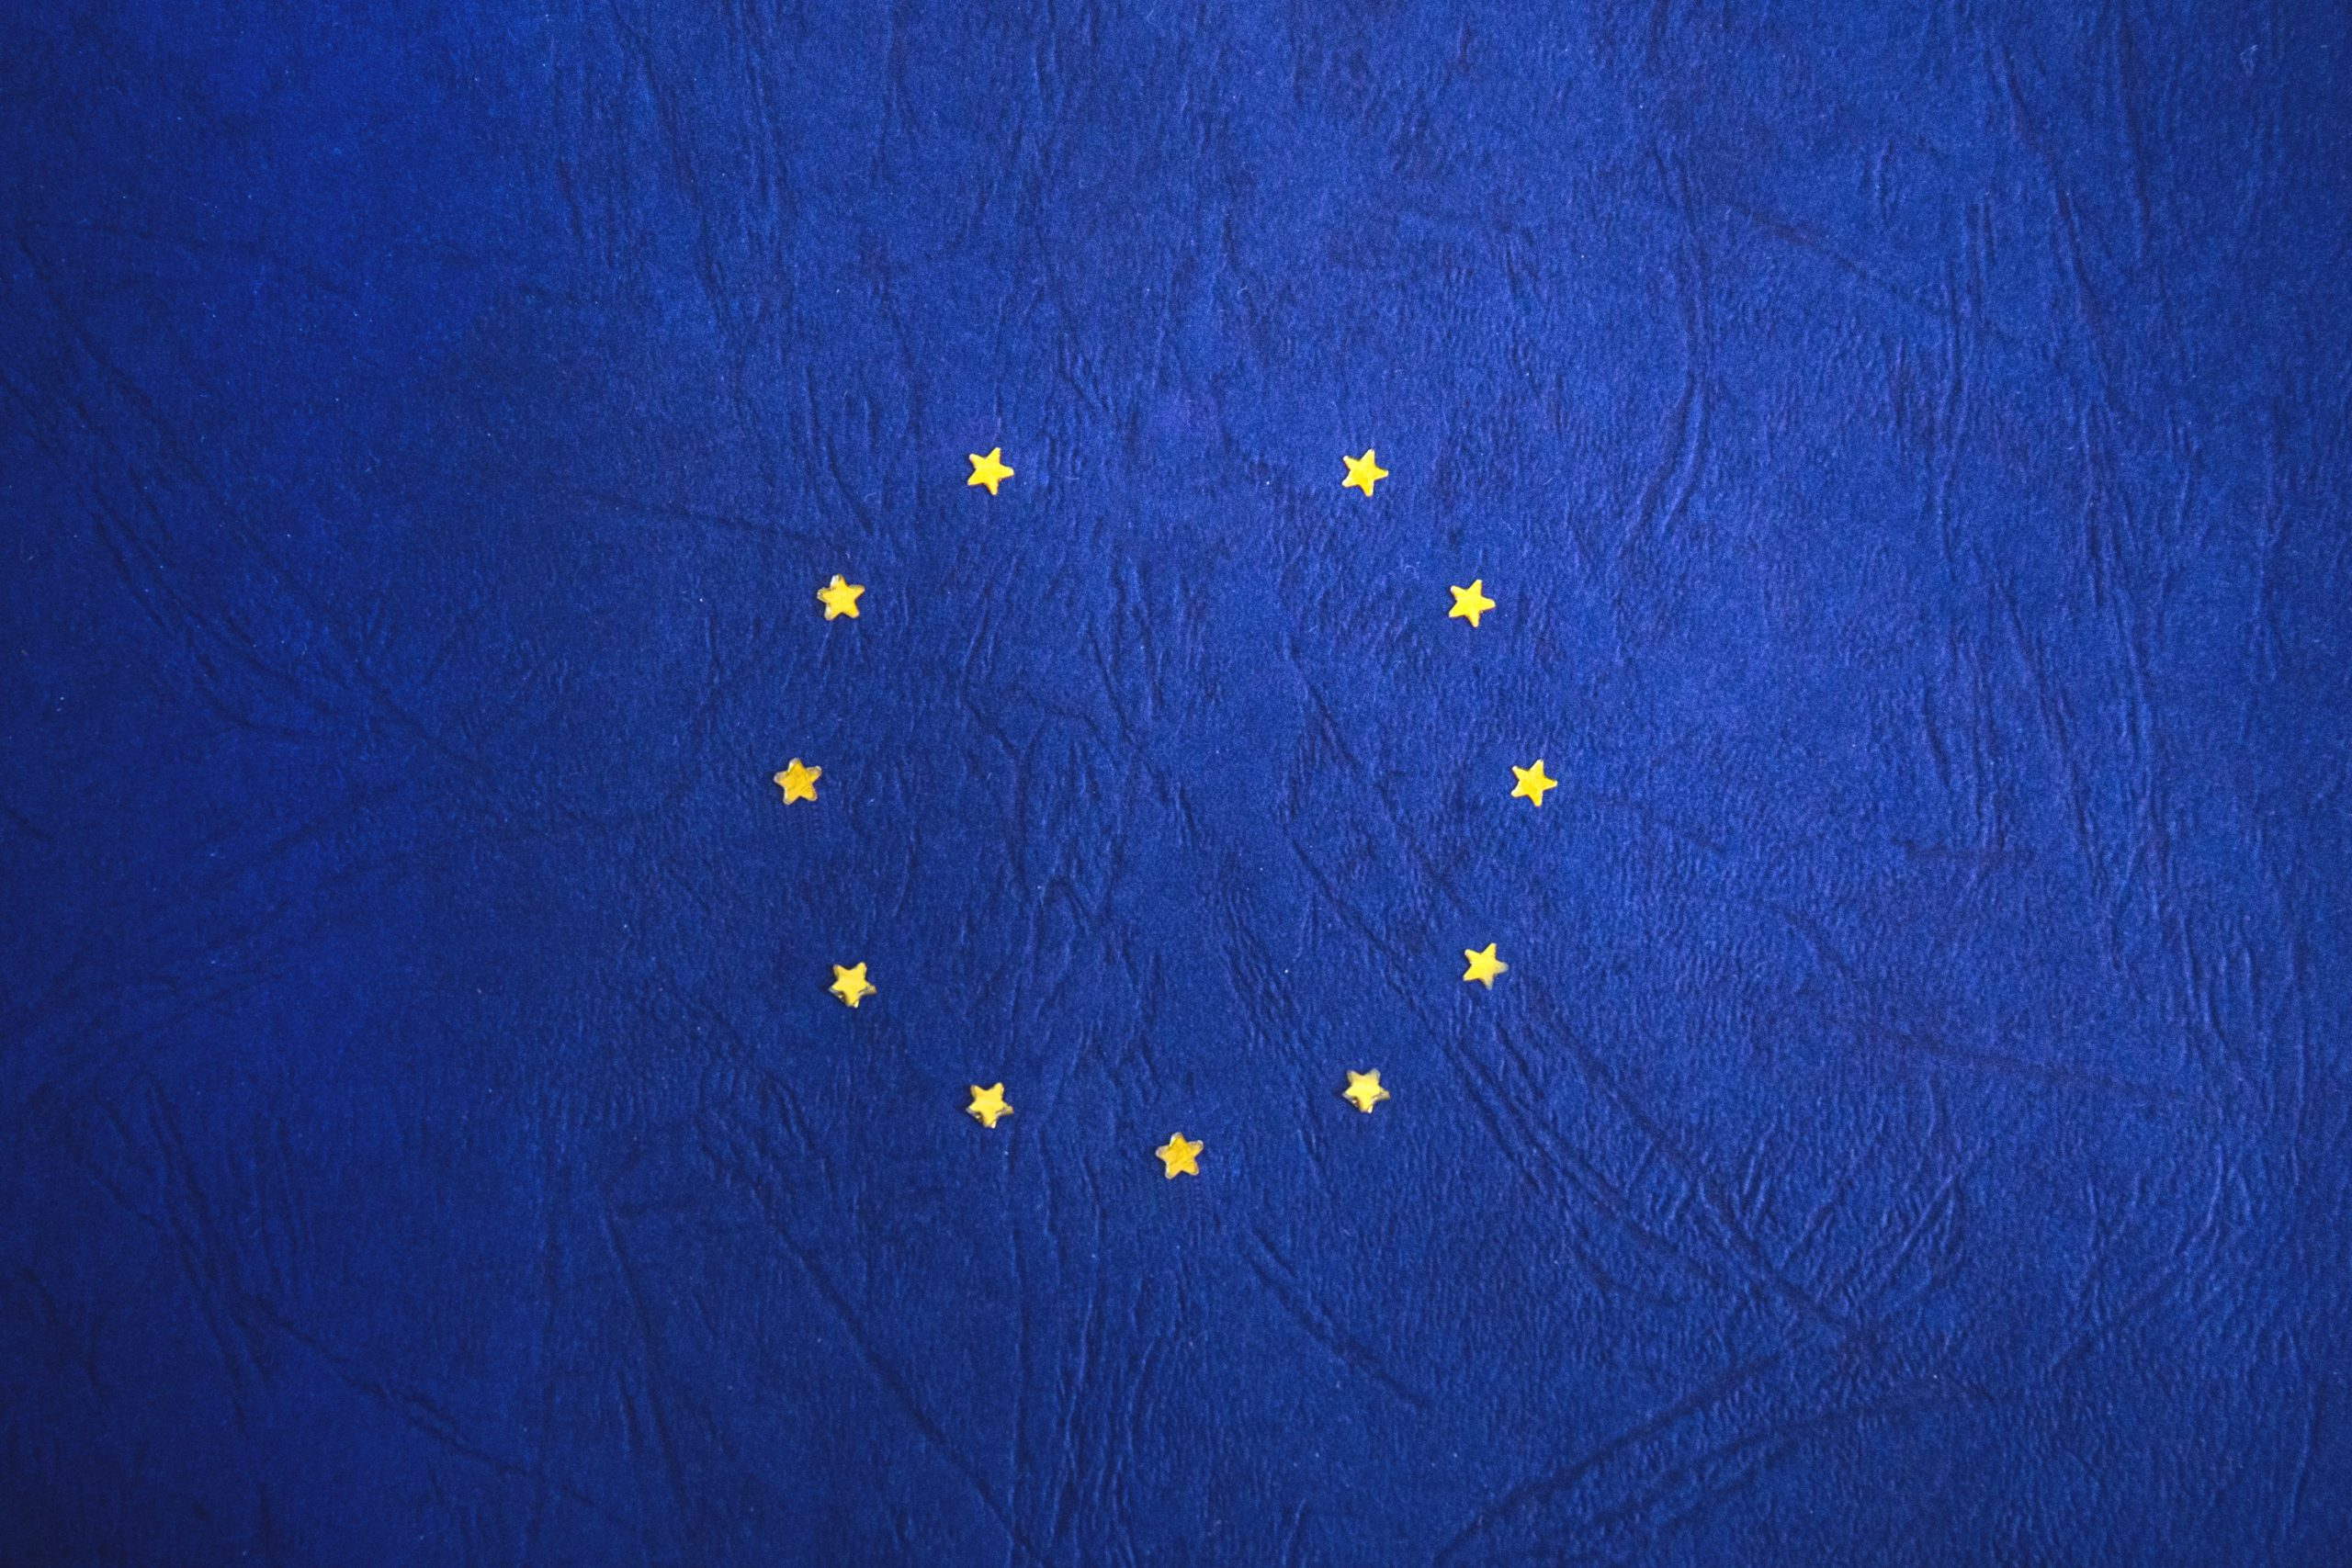 commisione europea